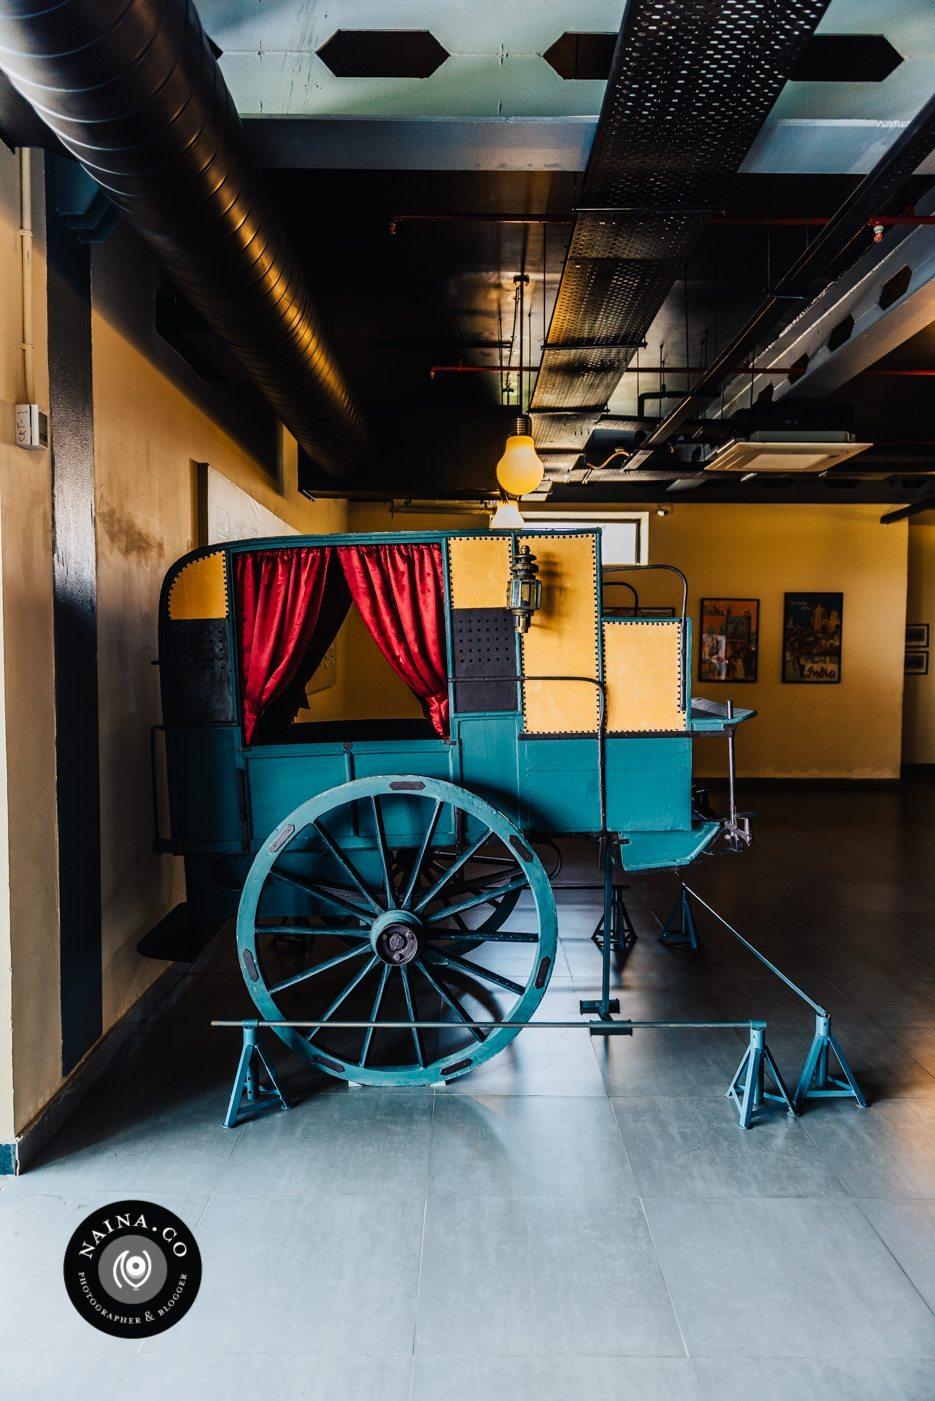 Naina.co-Raconteuse-Visuelle-Photographer-Blogger-Storyteller-Luxury-Lifestyle-March-2015-Heritage-Transport-Museum-Taoro-Haryana